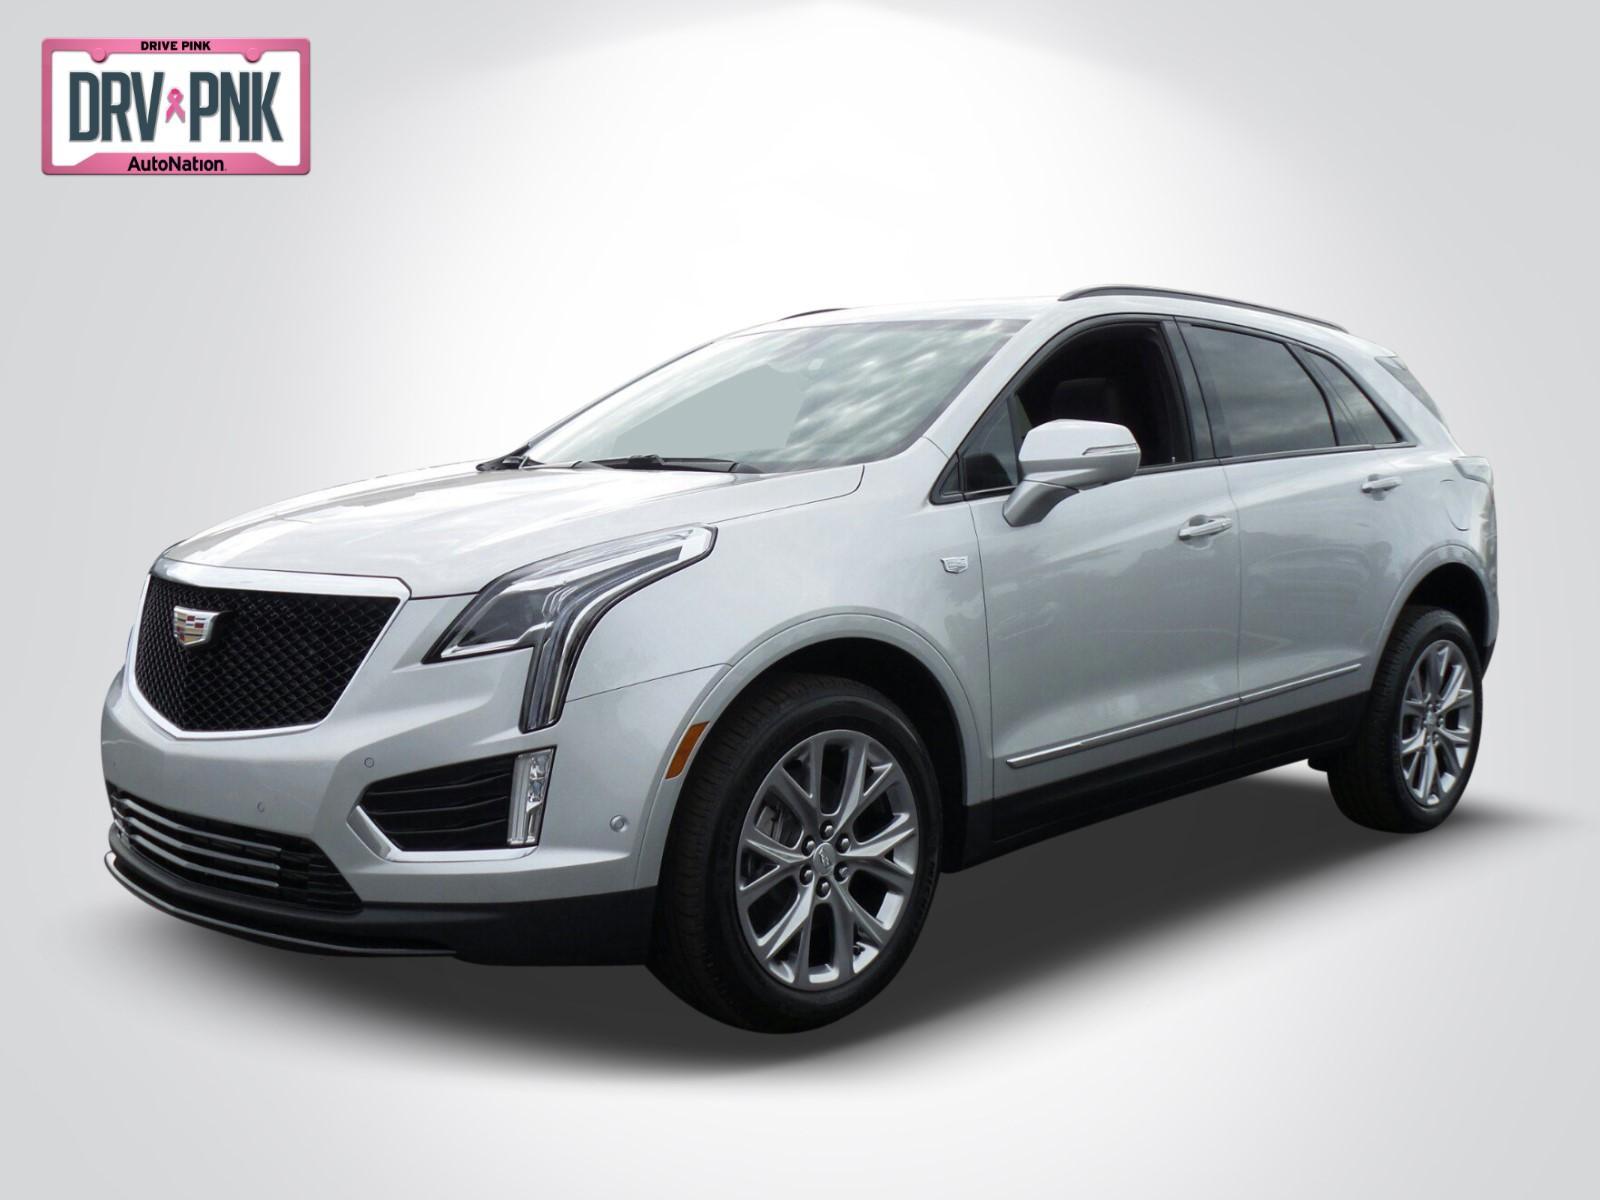 New 2021 Cadillac Xt5 Premium Luxury Price, Lease Deals ...